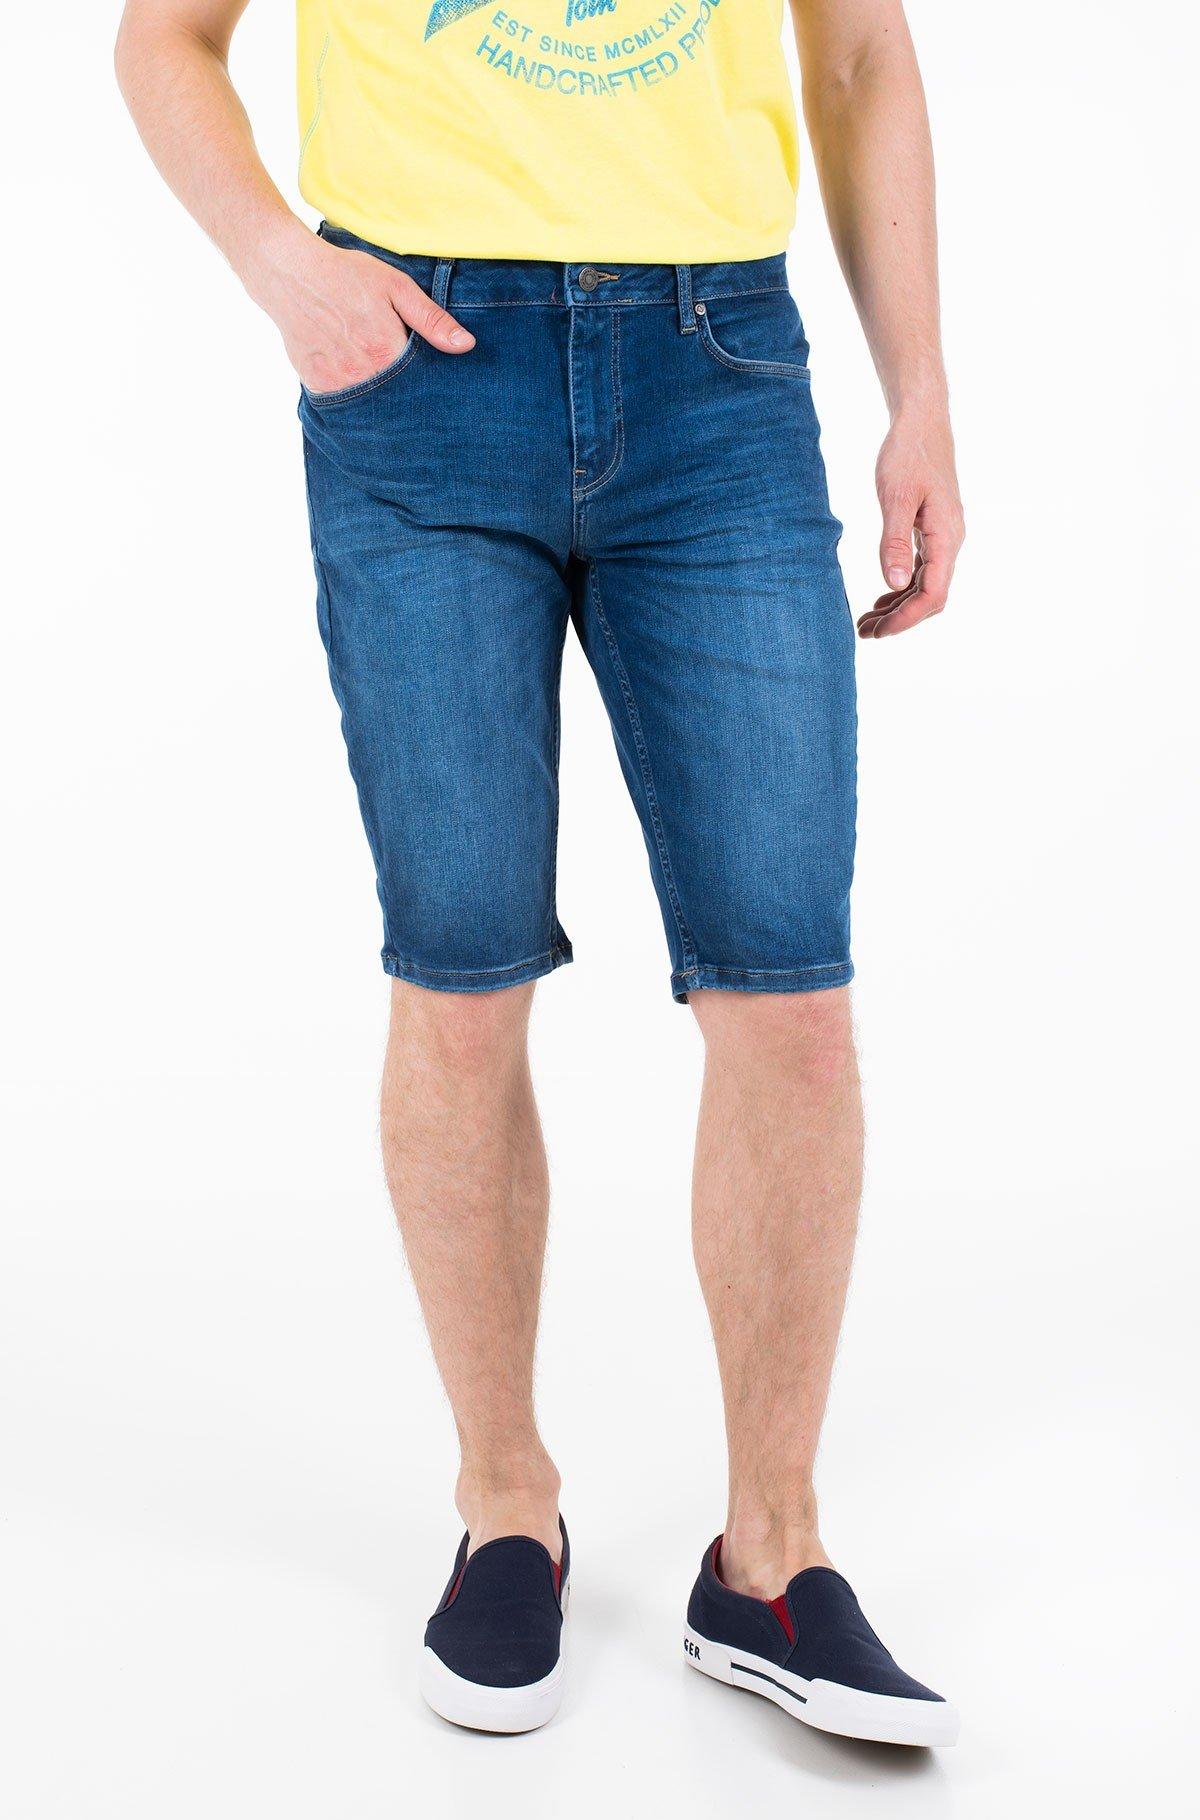 Shorts Jaanus03 shorts-full-1